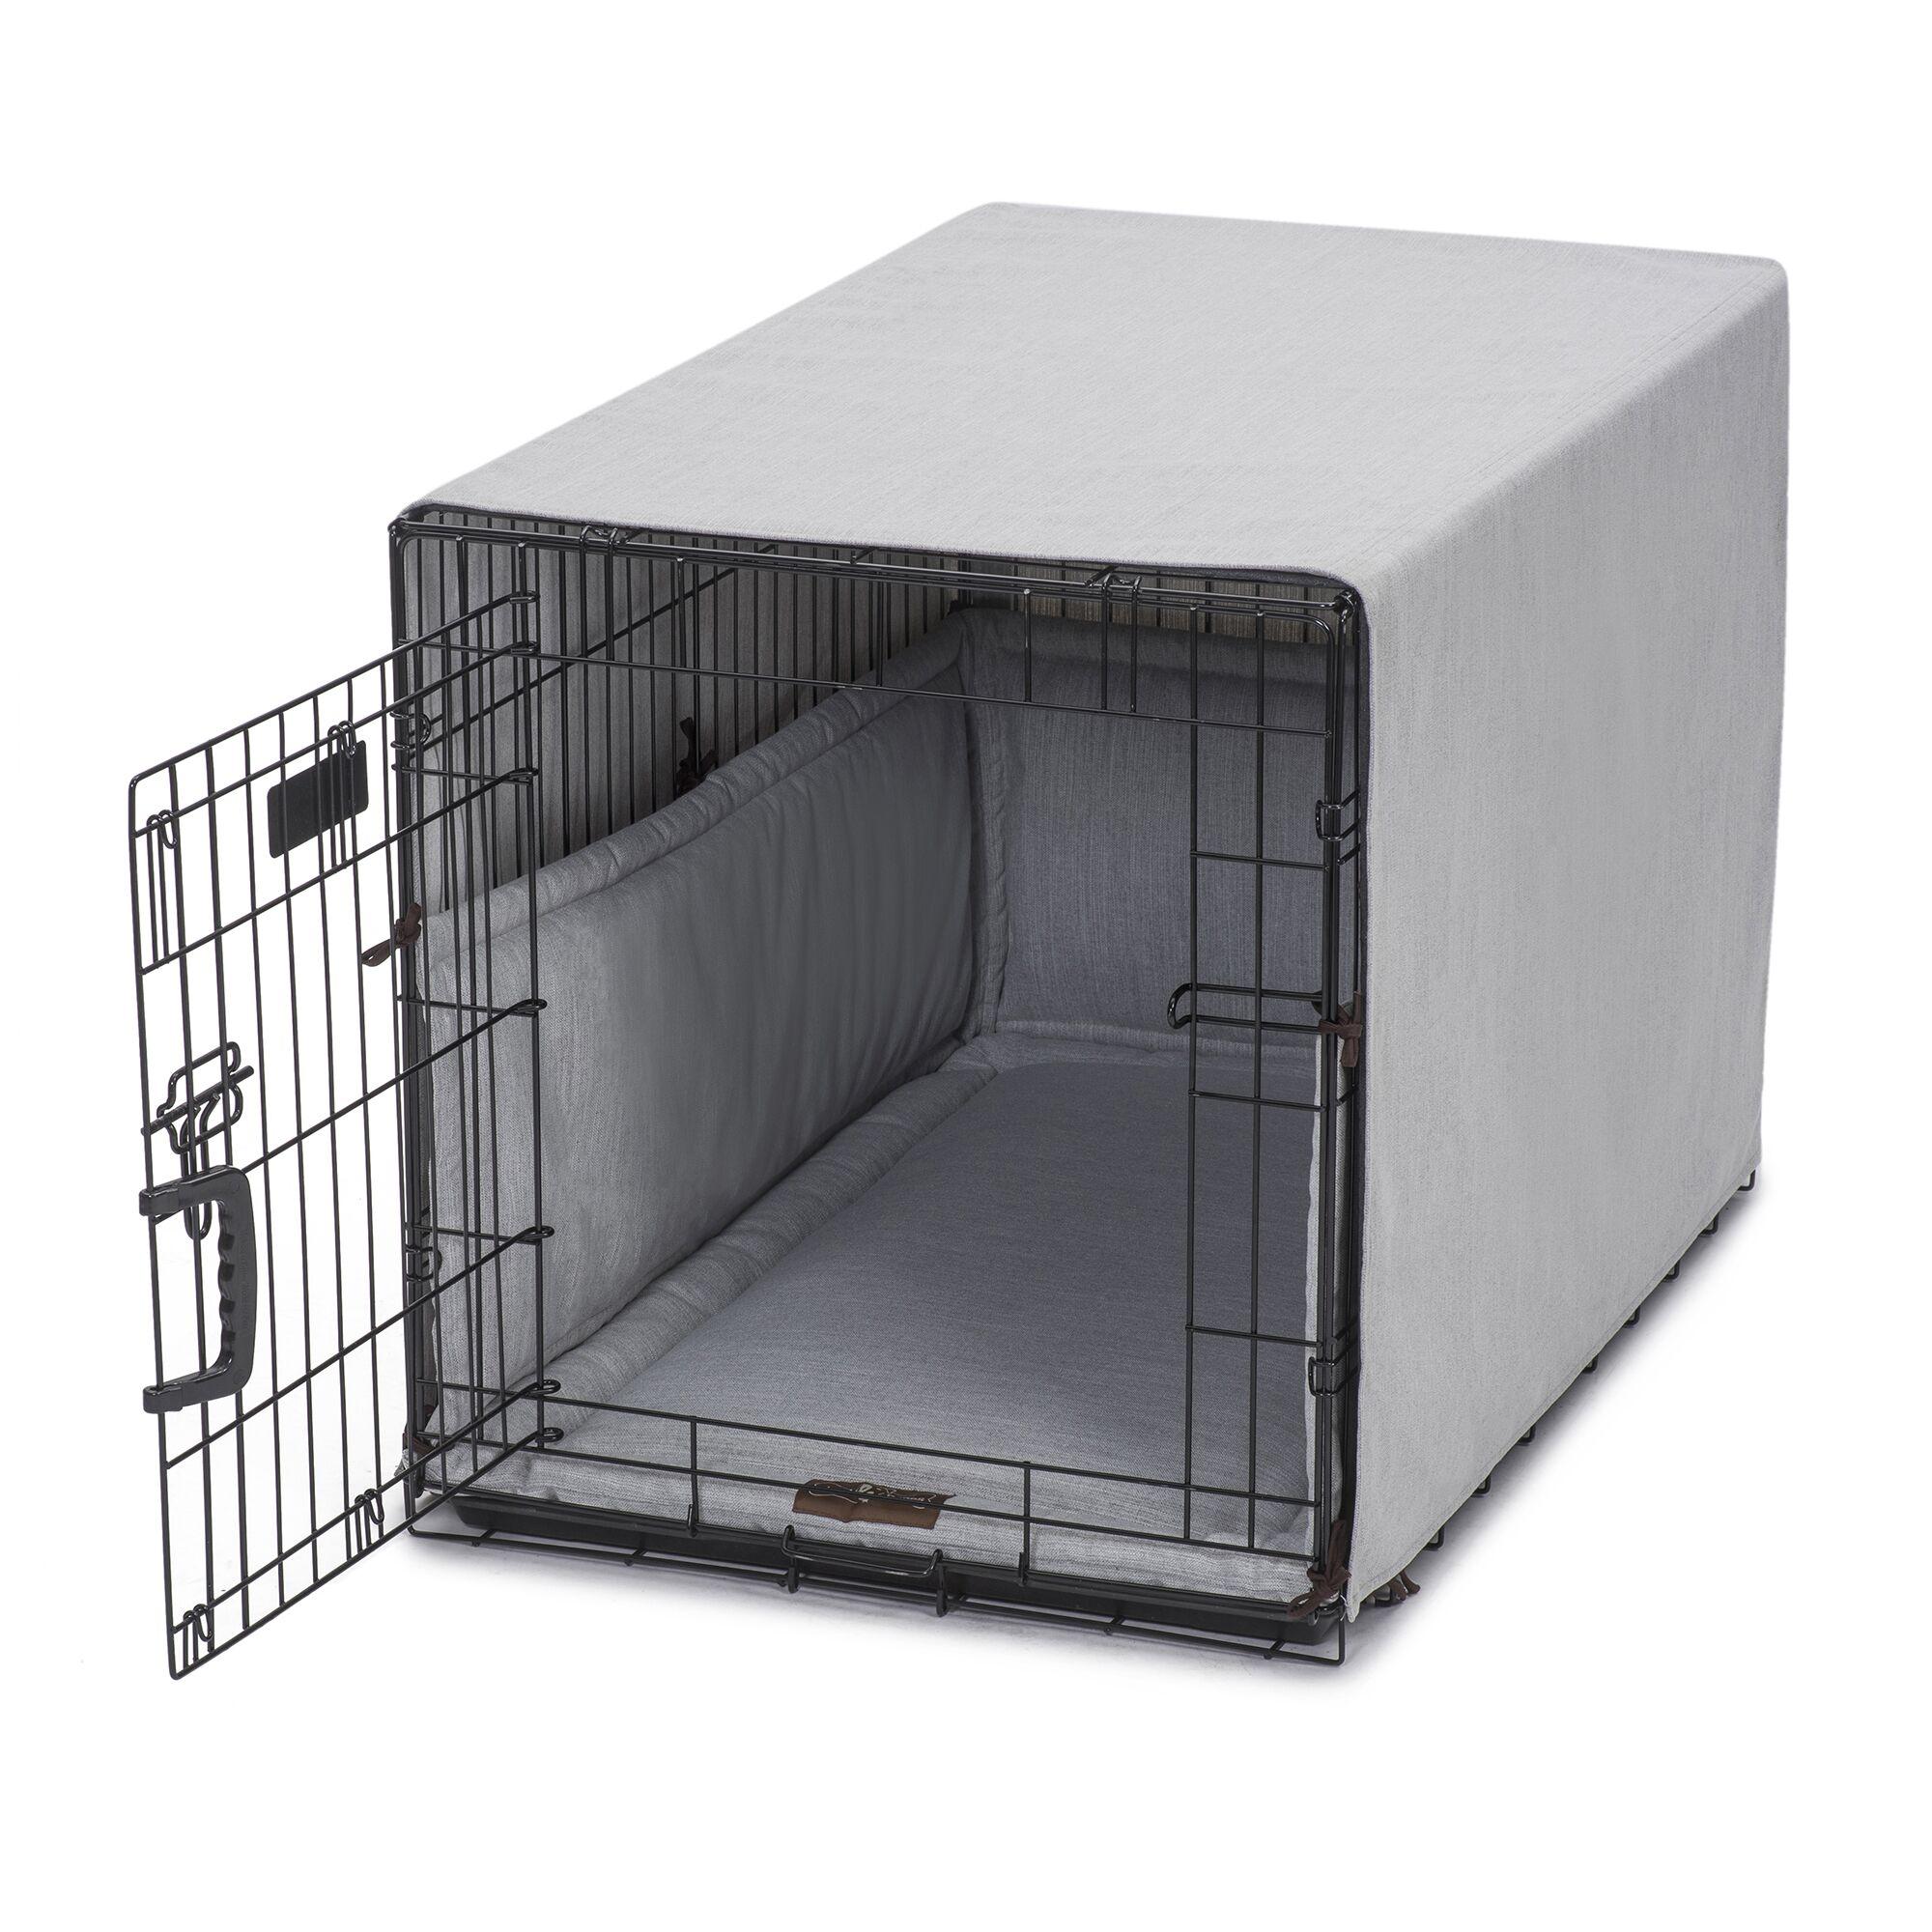 Windsor Permium Cotton Crate Cover Size: 23